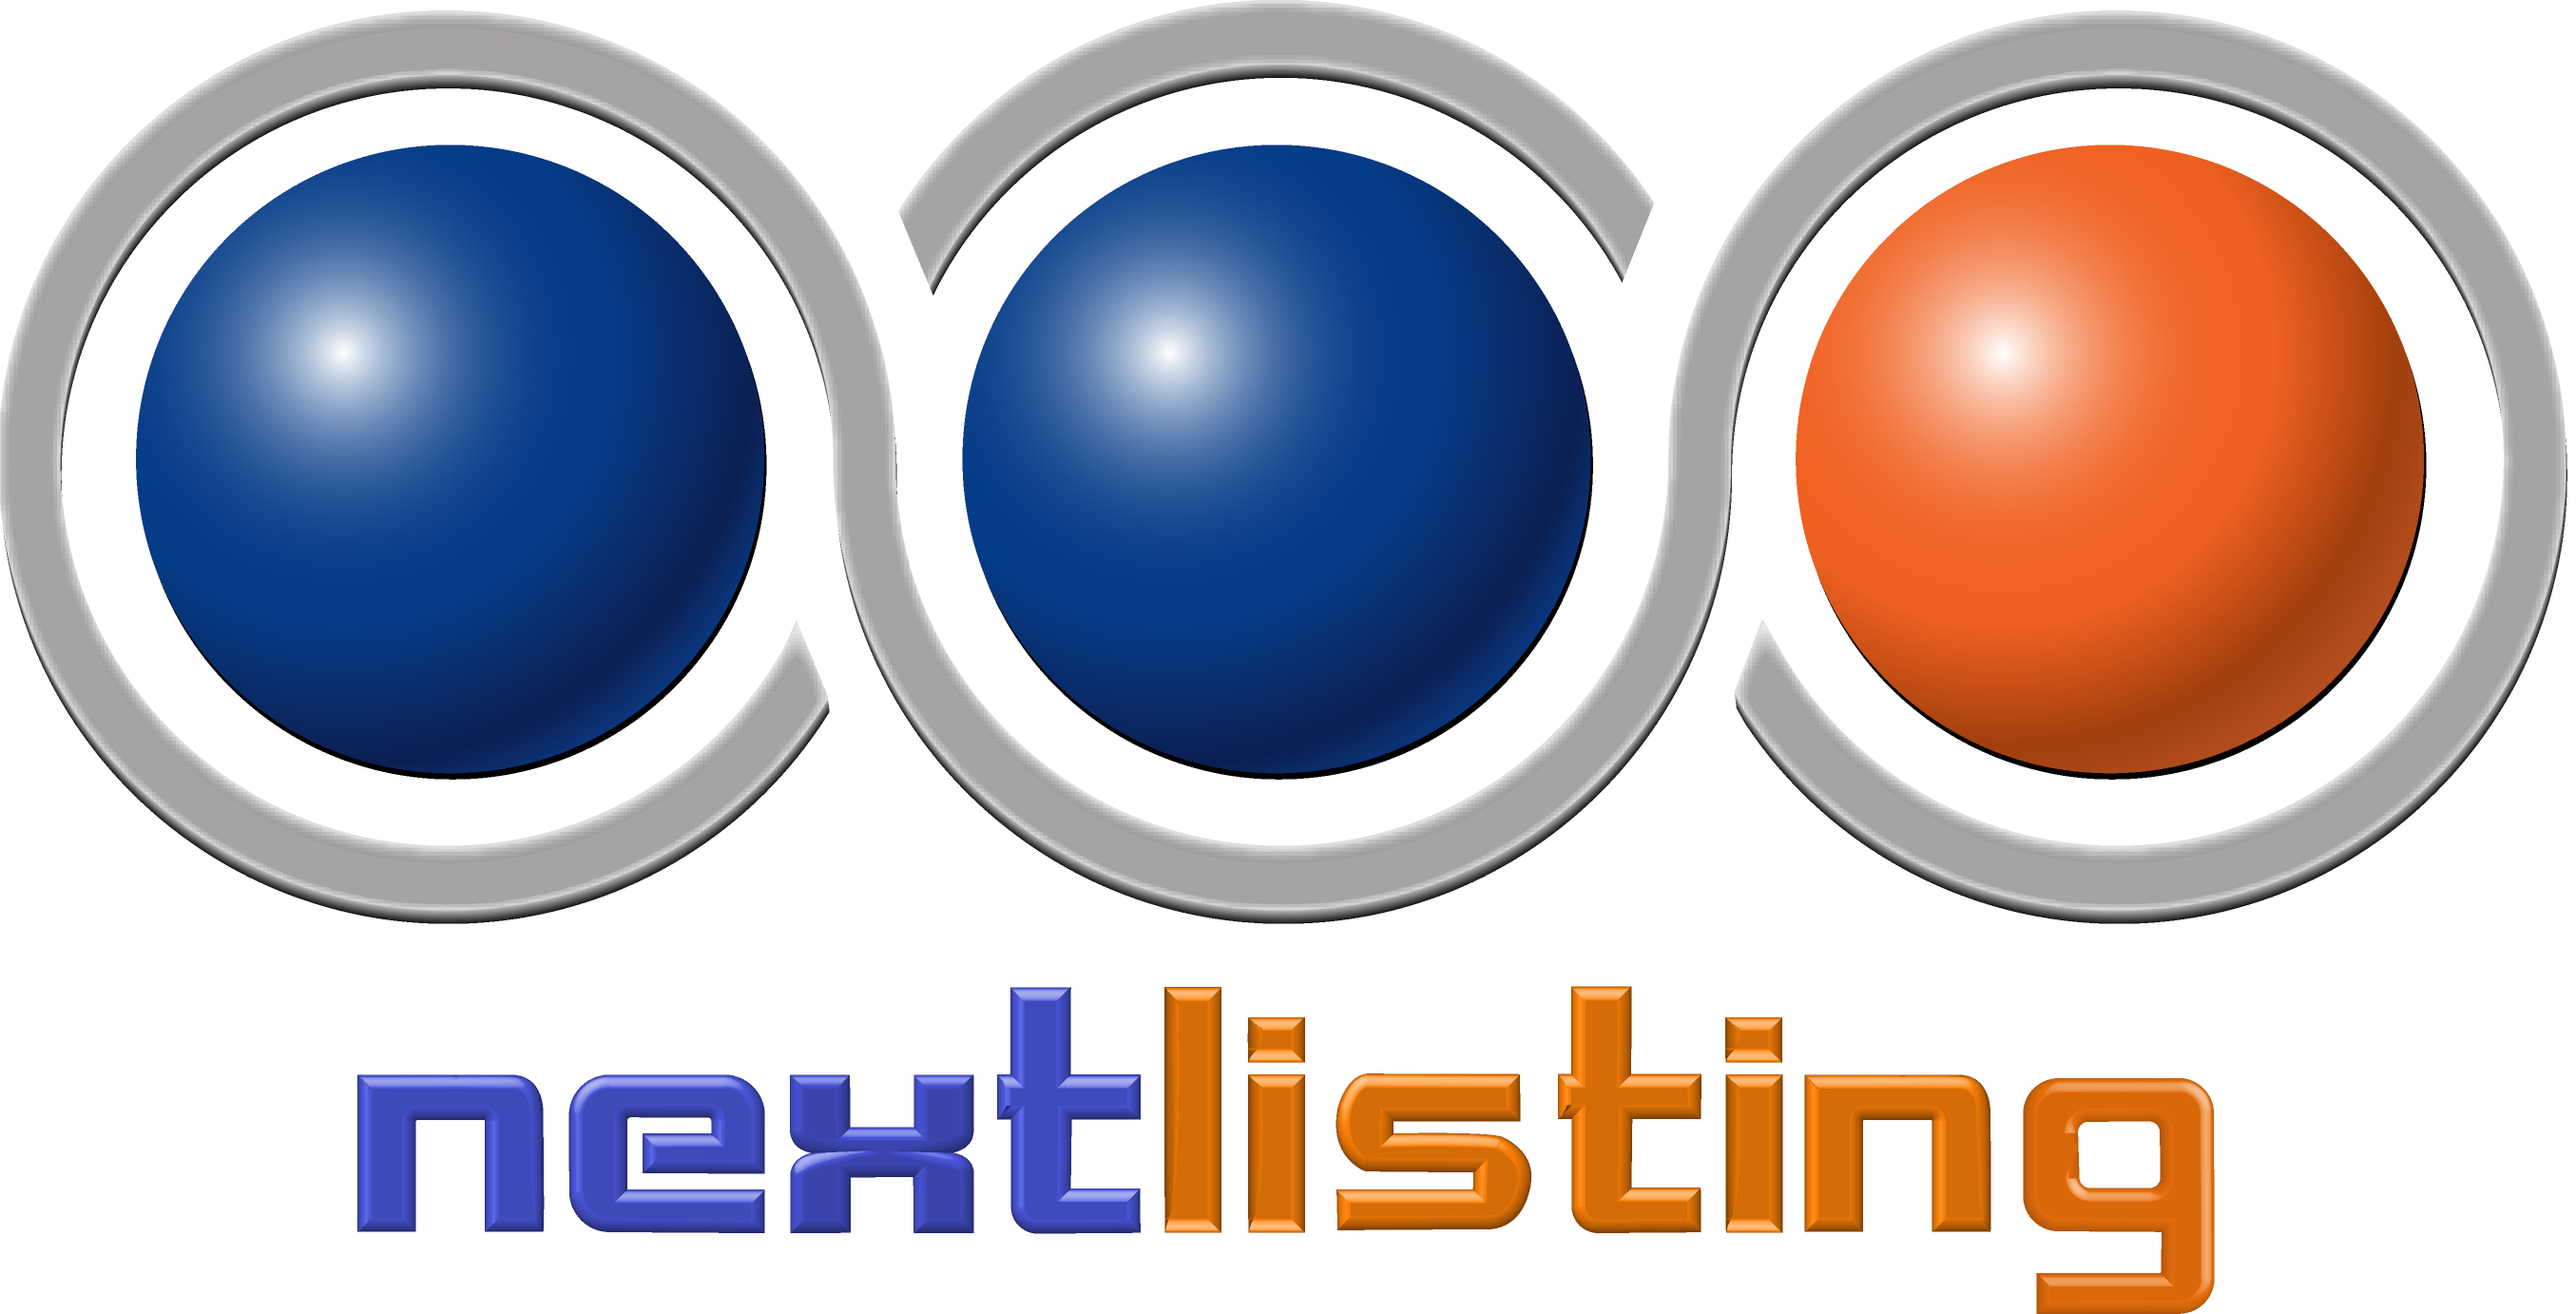 Videography | Next Listing, LLC